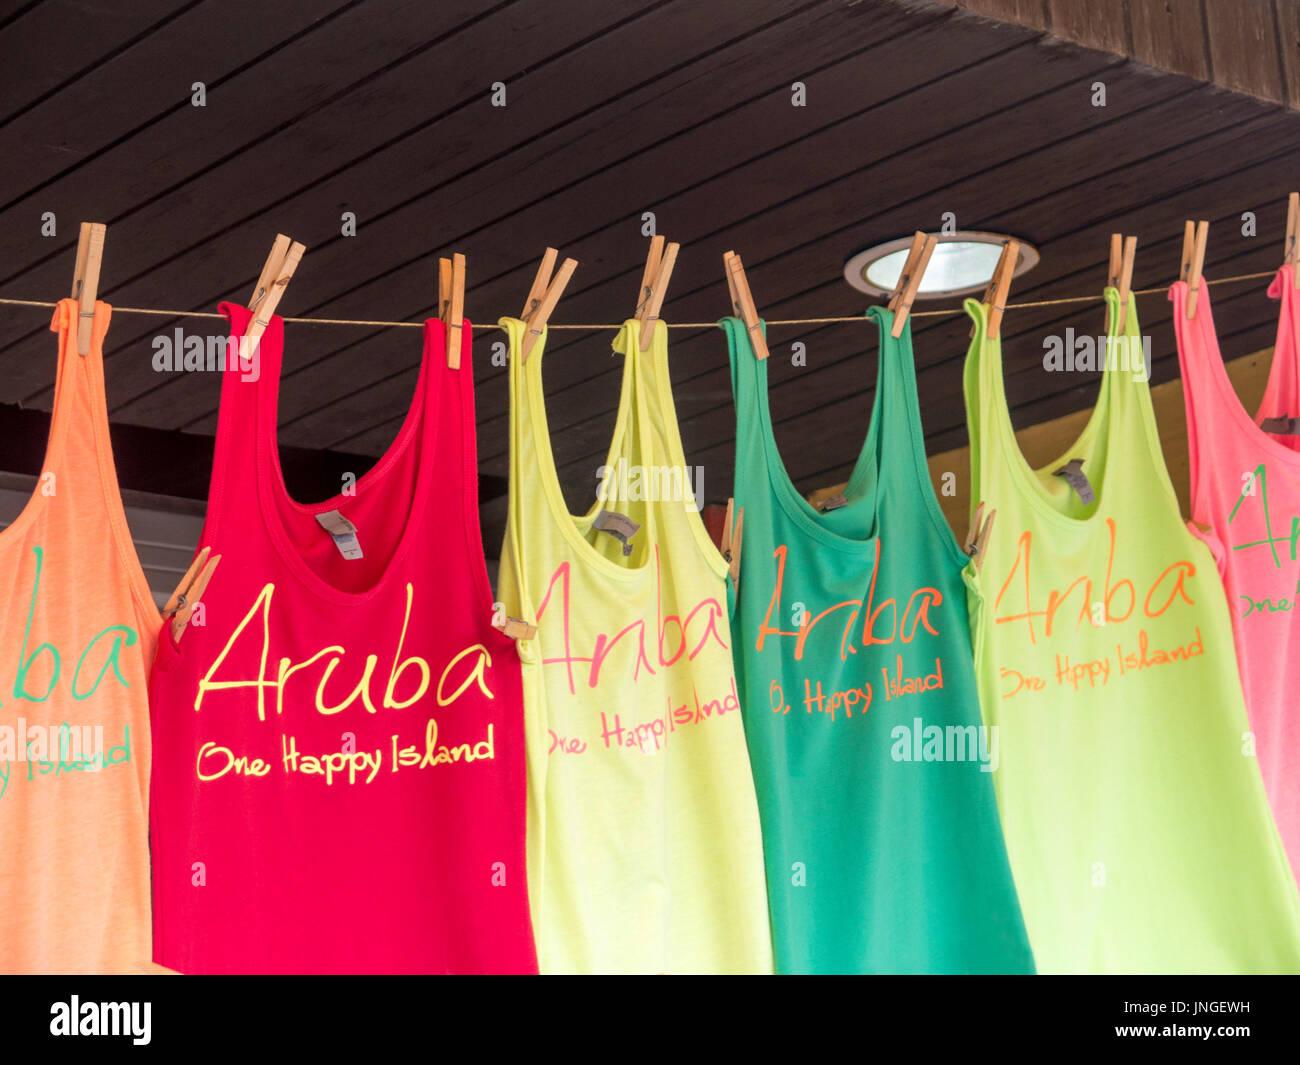 Souvenir shirts  for Sale at a tourist market In Oranjestad , Aruba - Stock Image